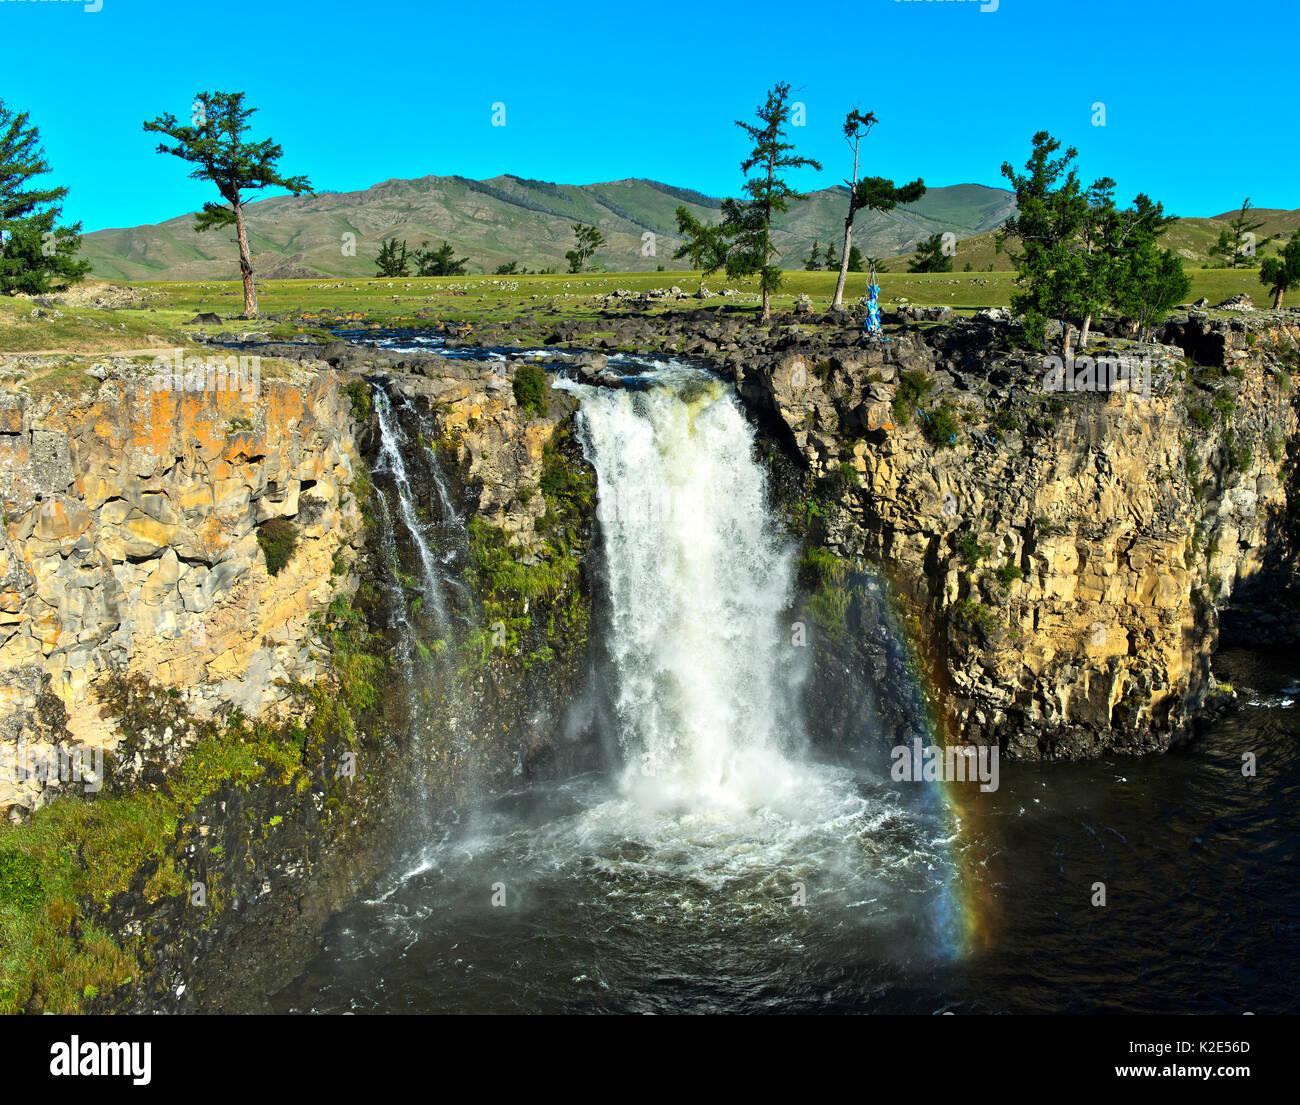 Orkhon Waterfall, Orchon Valley, Khangai Nuruu National Park, Övörkhangai Aimag, Mongolia - Stock Image